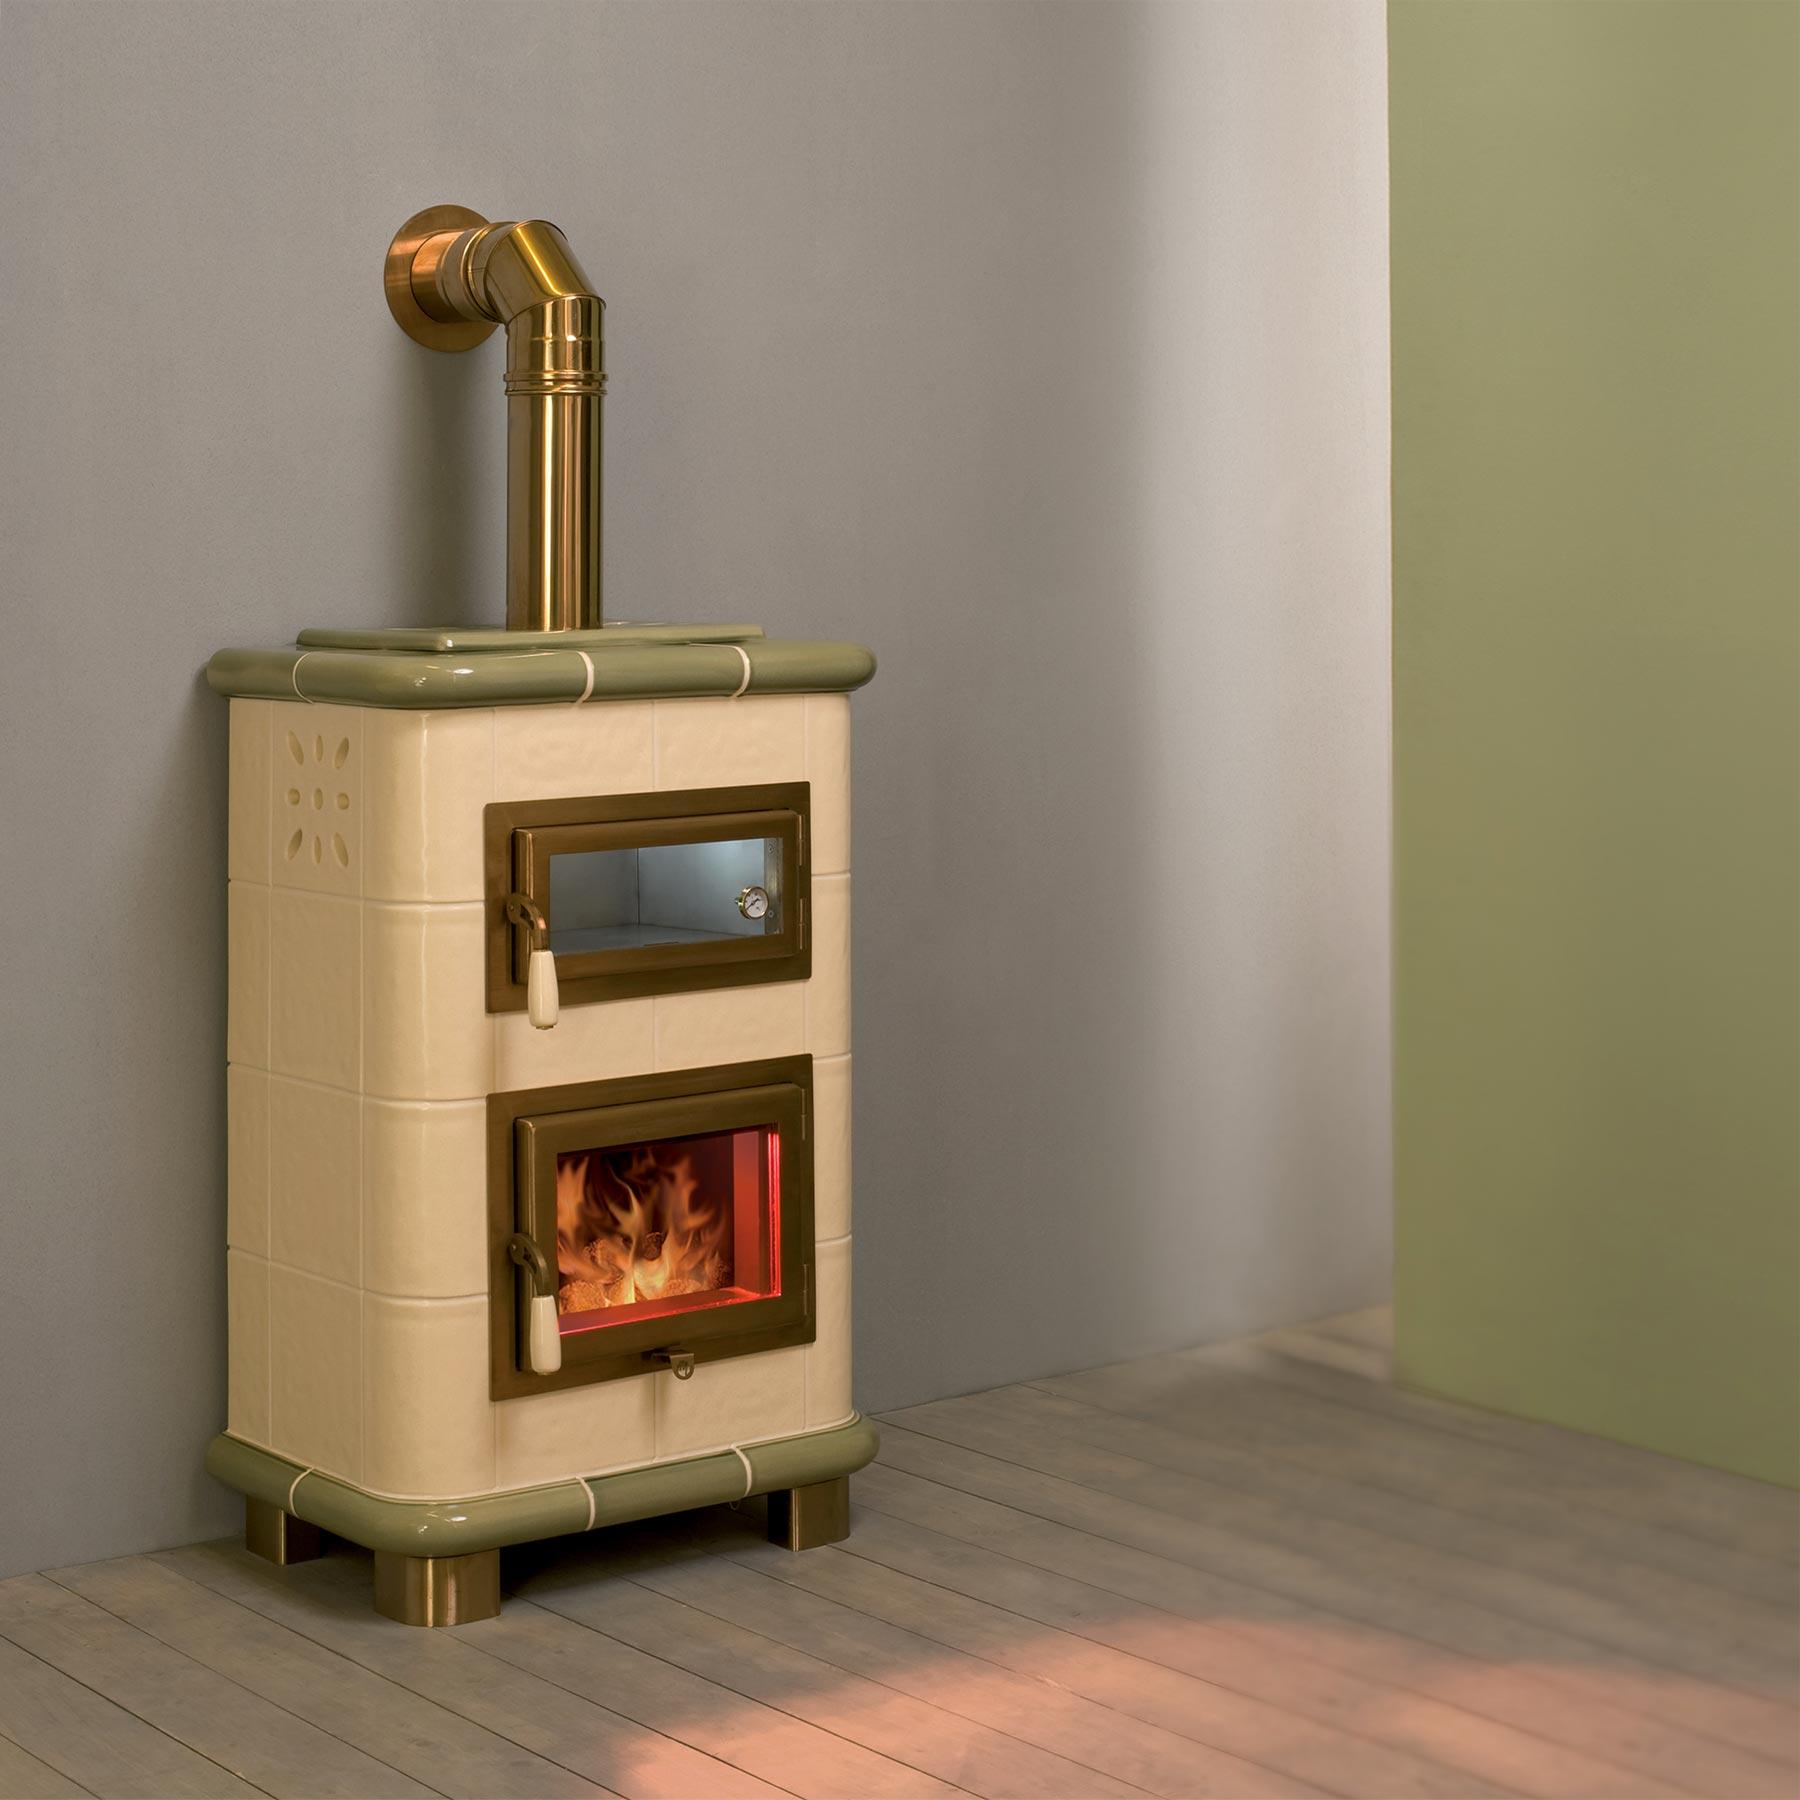 Stufa a legna classica saturno mt design stufe - Stufe a legna ventilate ...